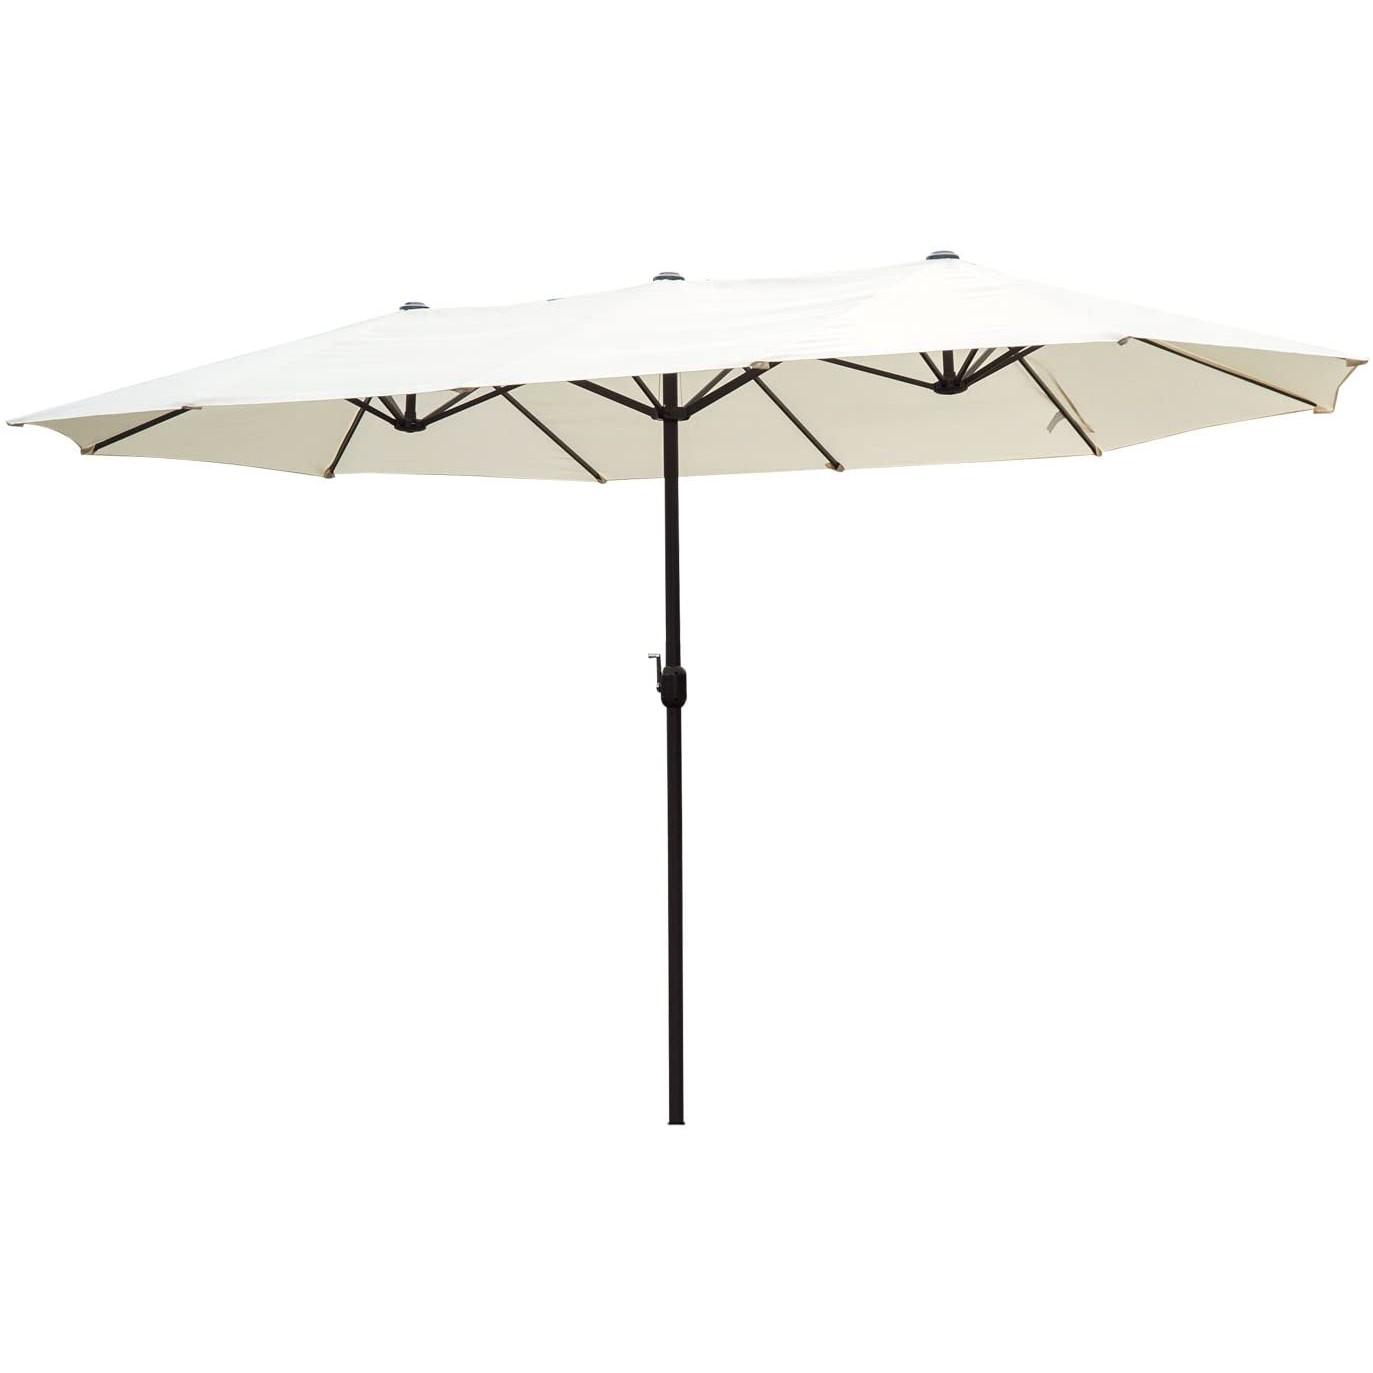 15 feet double canopy patio umbrella wide outdoor patio market umbrella double sided with crank uv resistant water proof buy outdoor garden patio